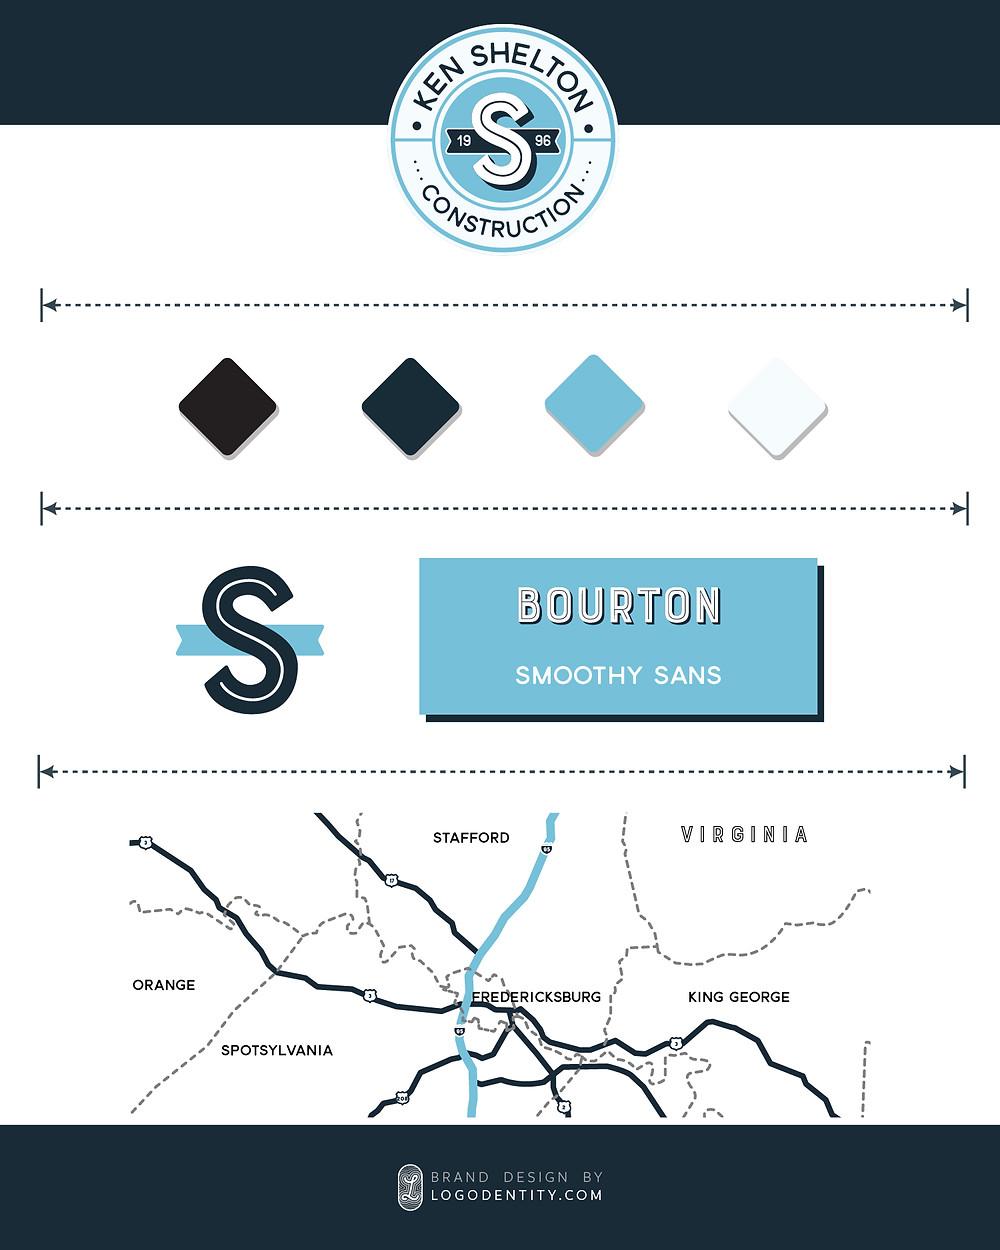 Ken Shelton Construction's Mini Brand Style Guide